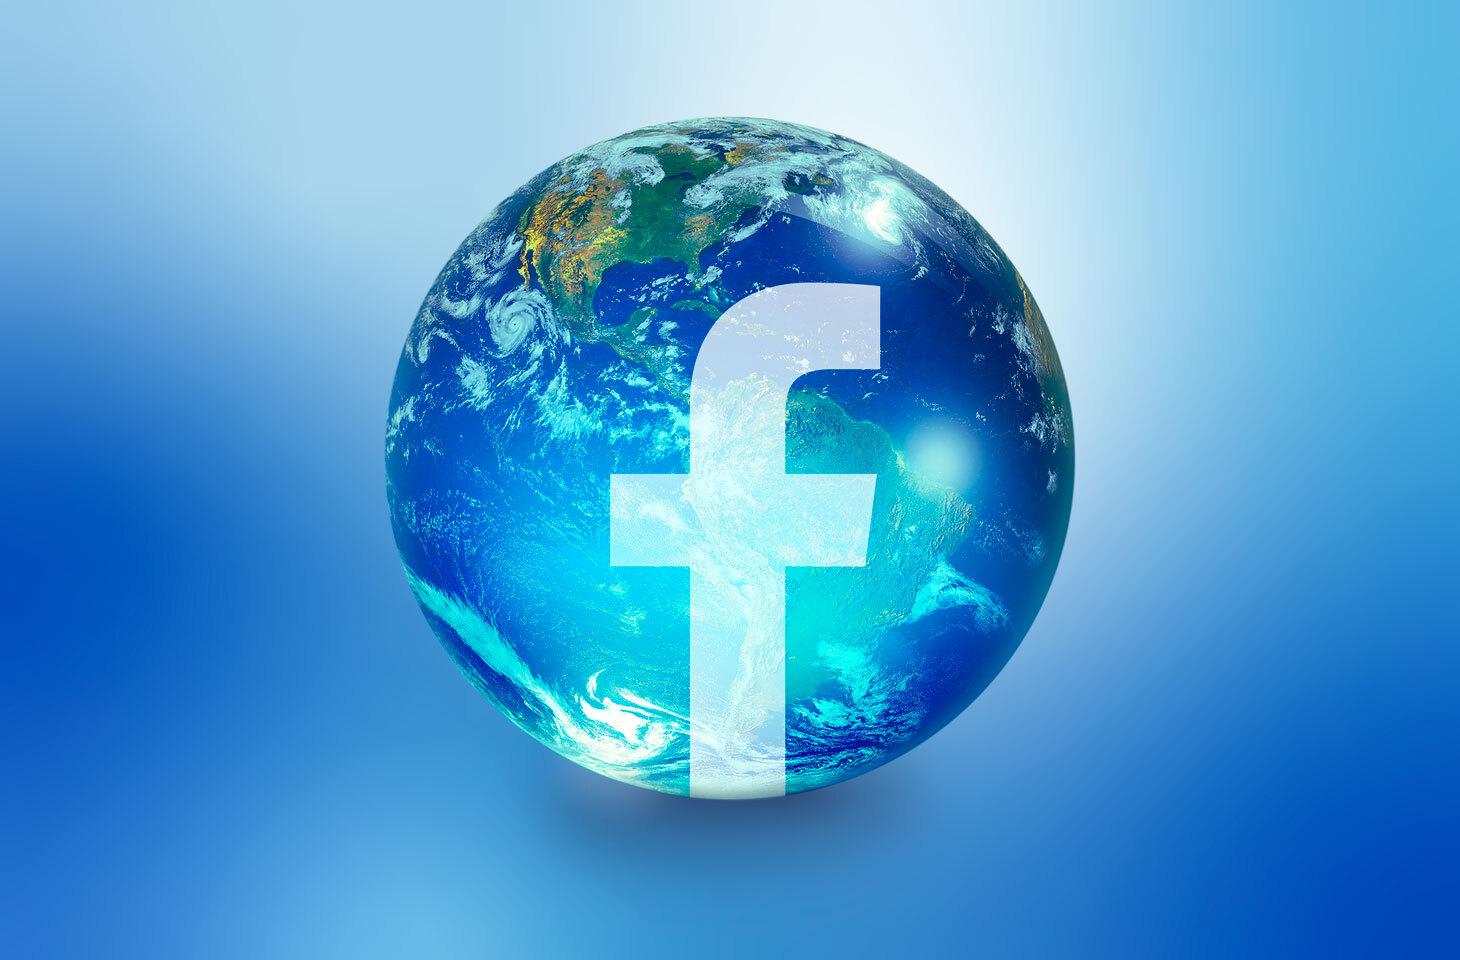 「Facebook外のアクティビティ」を設定する方法と理由 | カスペルスキー公式ブログ